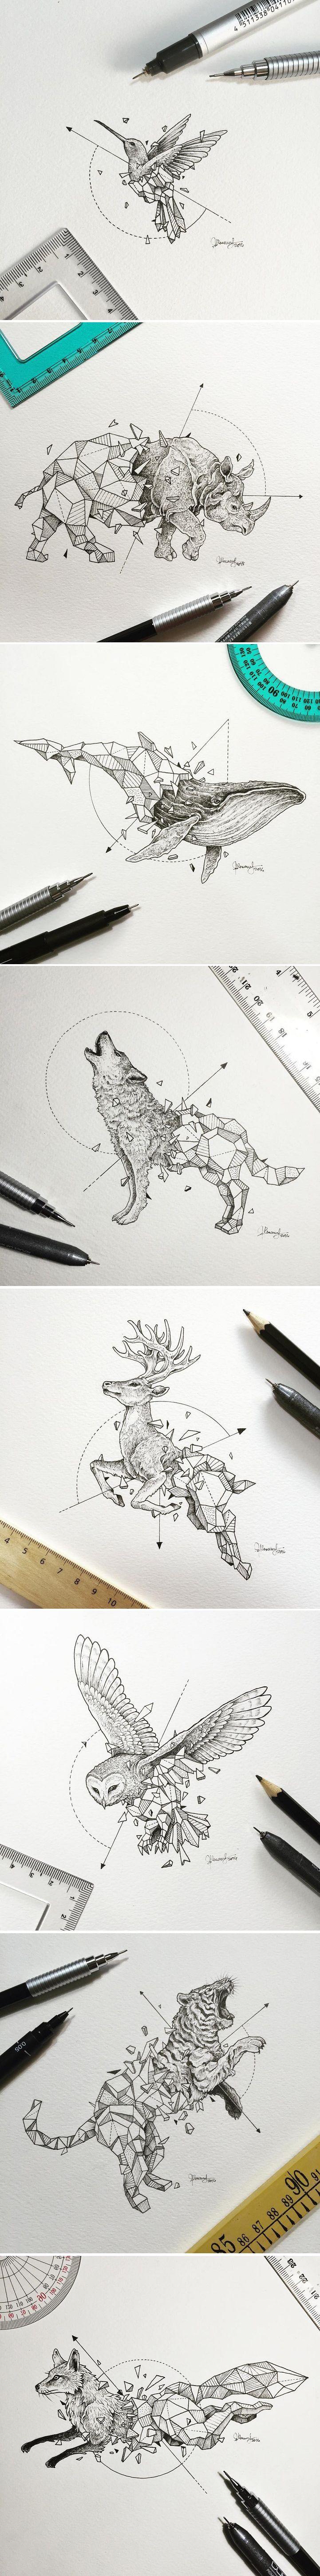 Armband Tatto. Idee: Elephant unten geometrisch und oben Aquarell